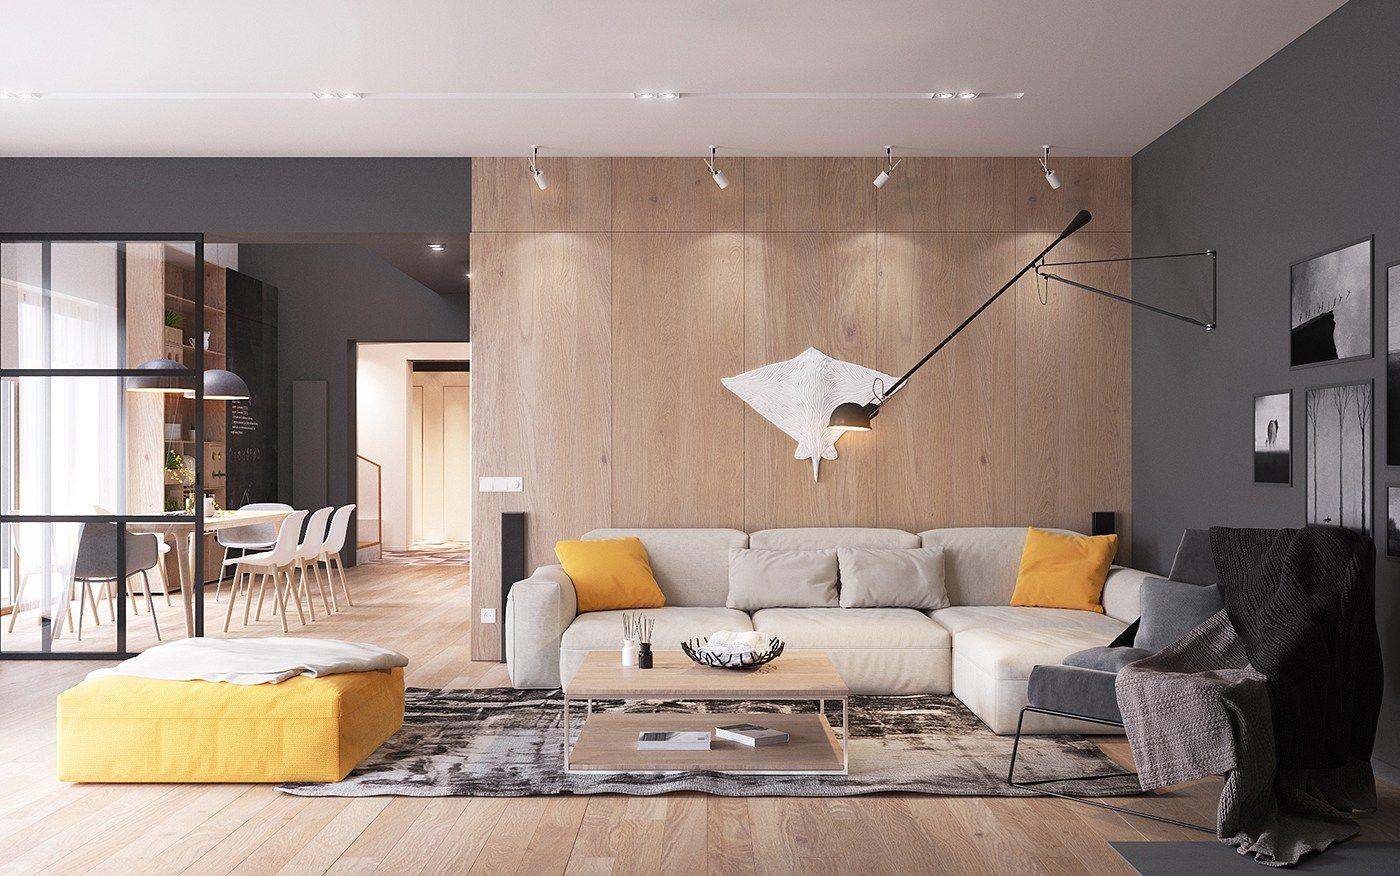 Originale appartamento stile scandinavo moderno. Design unico ed ...